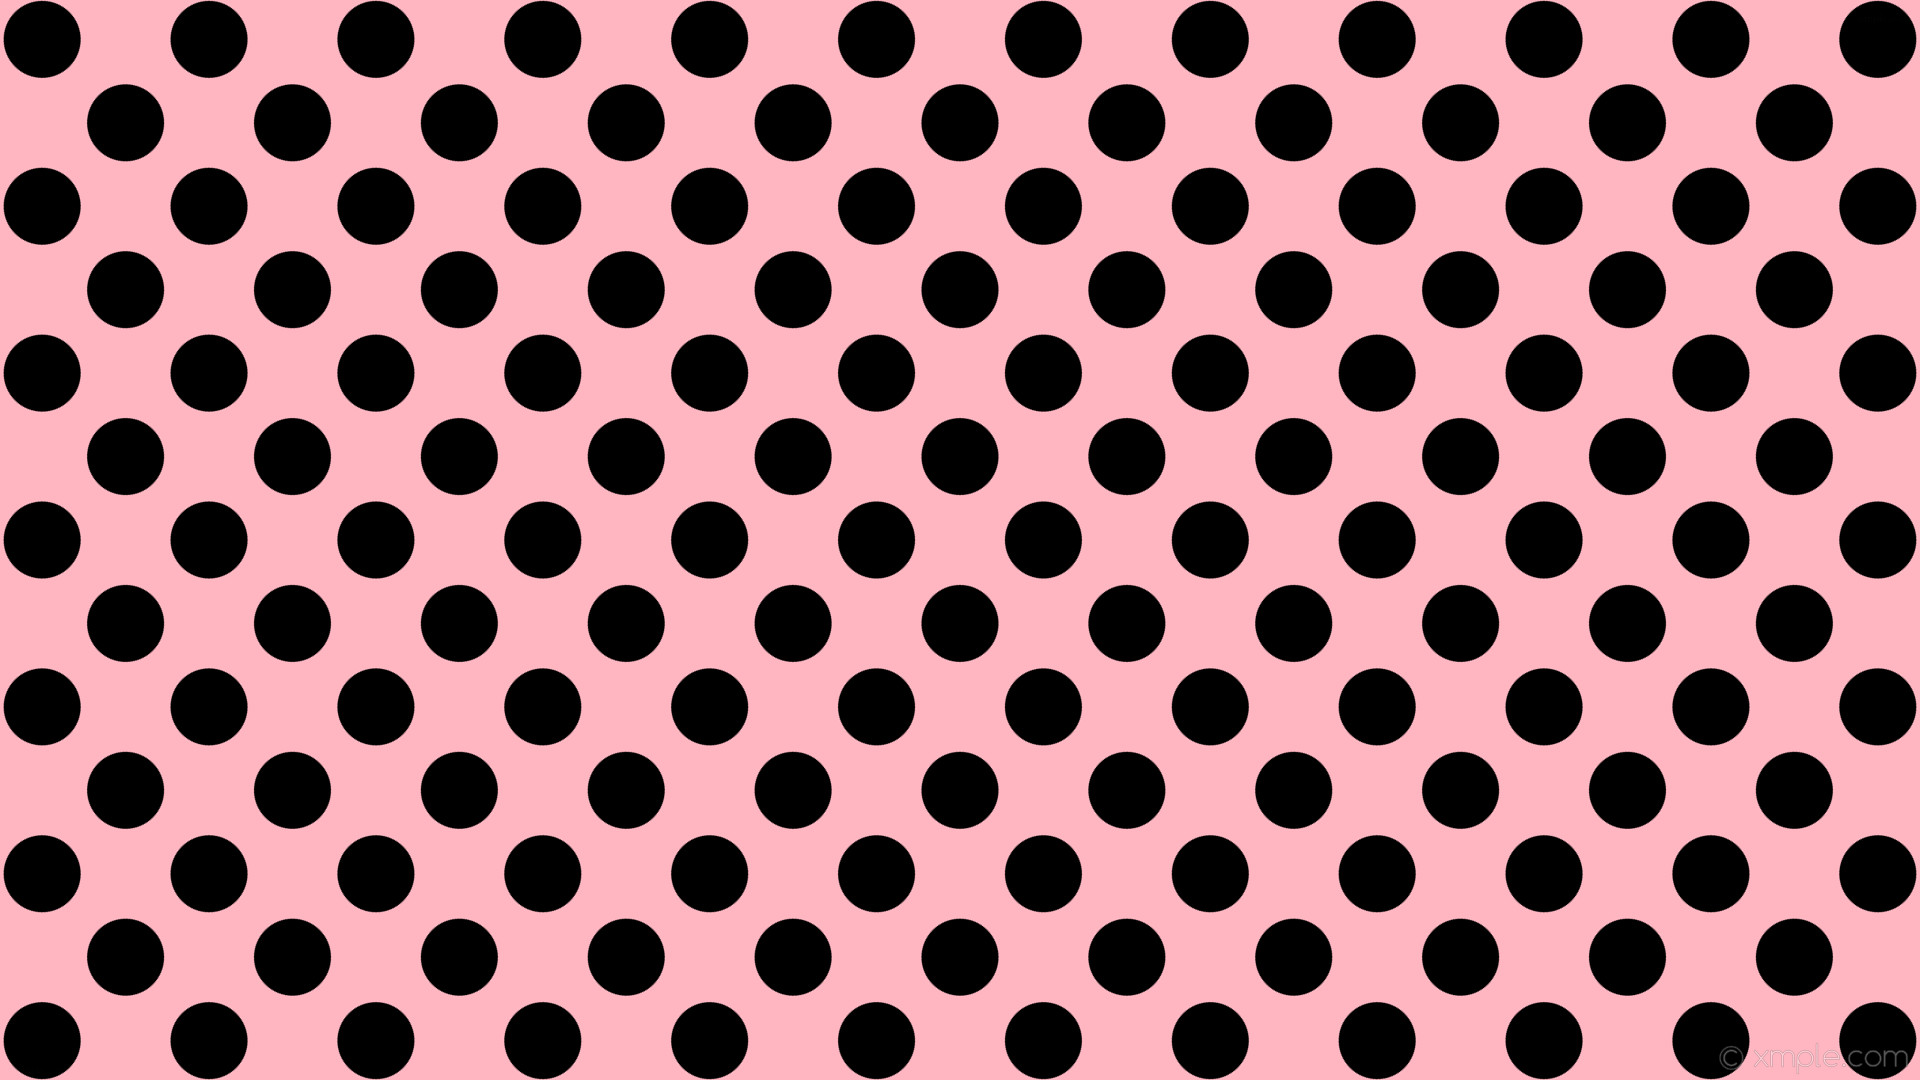 wallpaper dots polka pink spots black light pink #ffb6c1 #000000 135° 77px  118px